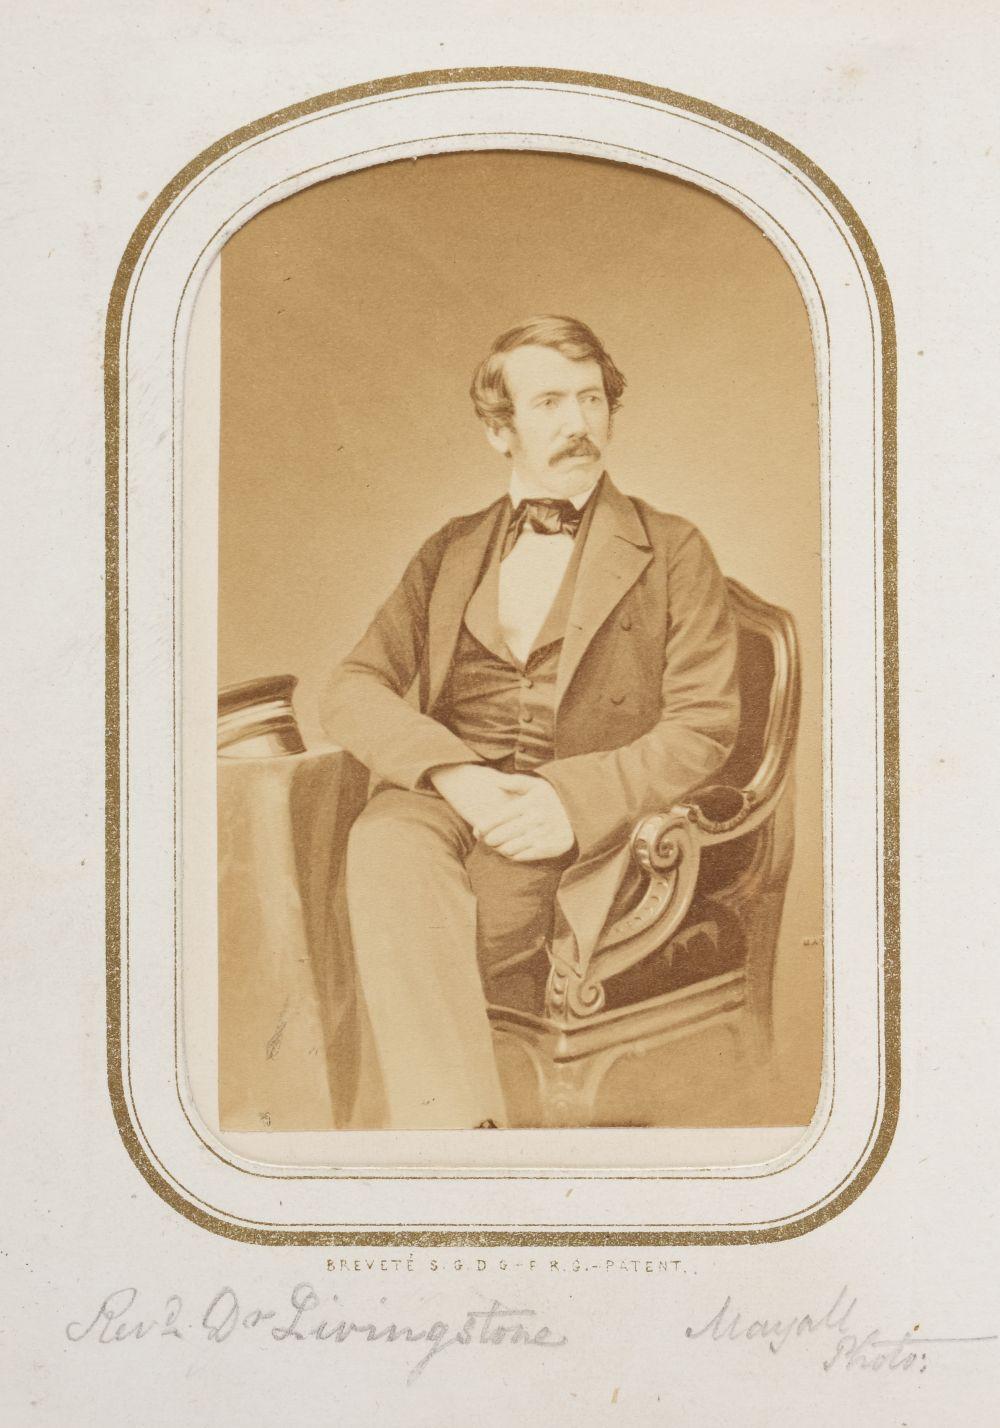 * Cartes de visite. A cartes-de-visite album, c. 1860s/1880s - Image 3 of 18